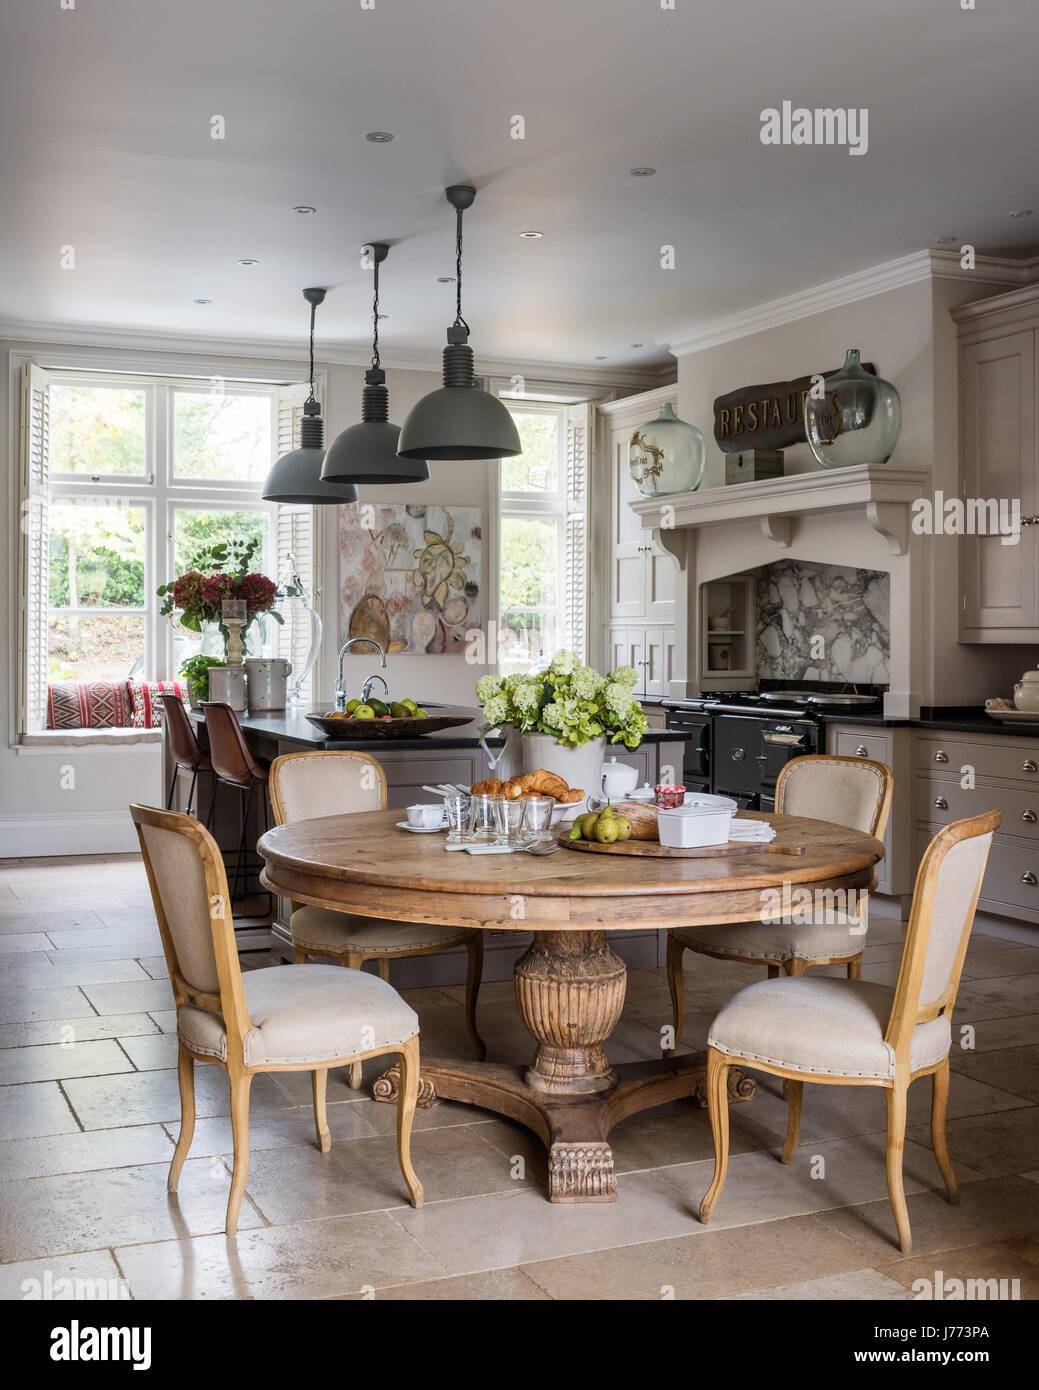 Spaziosa cucina con pavimento di pietra calcarea e piastrelle cucina ...